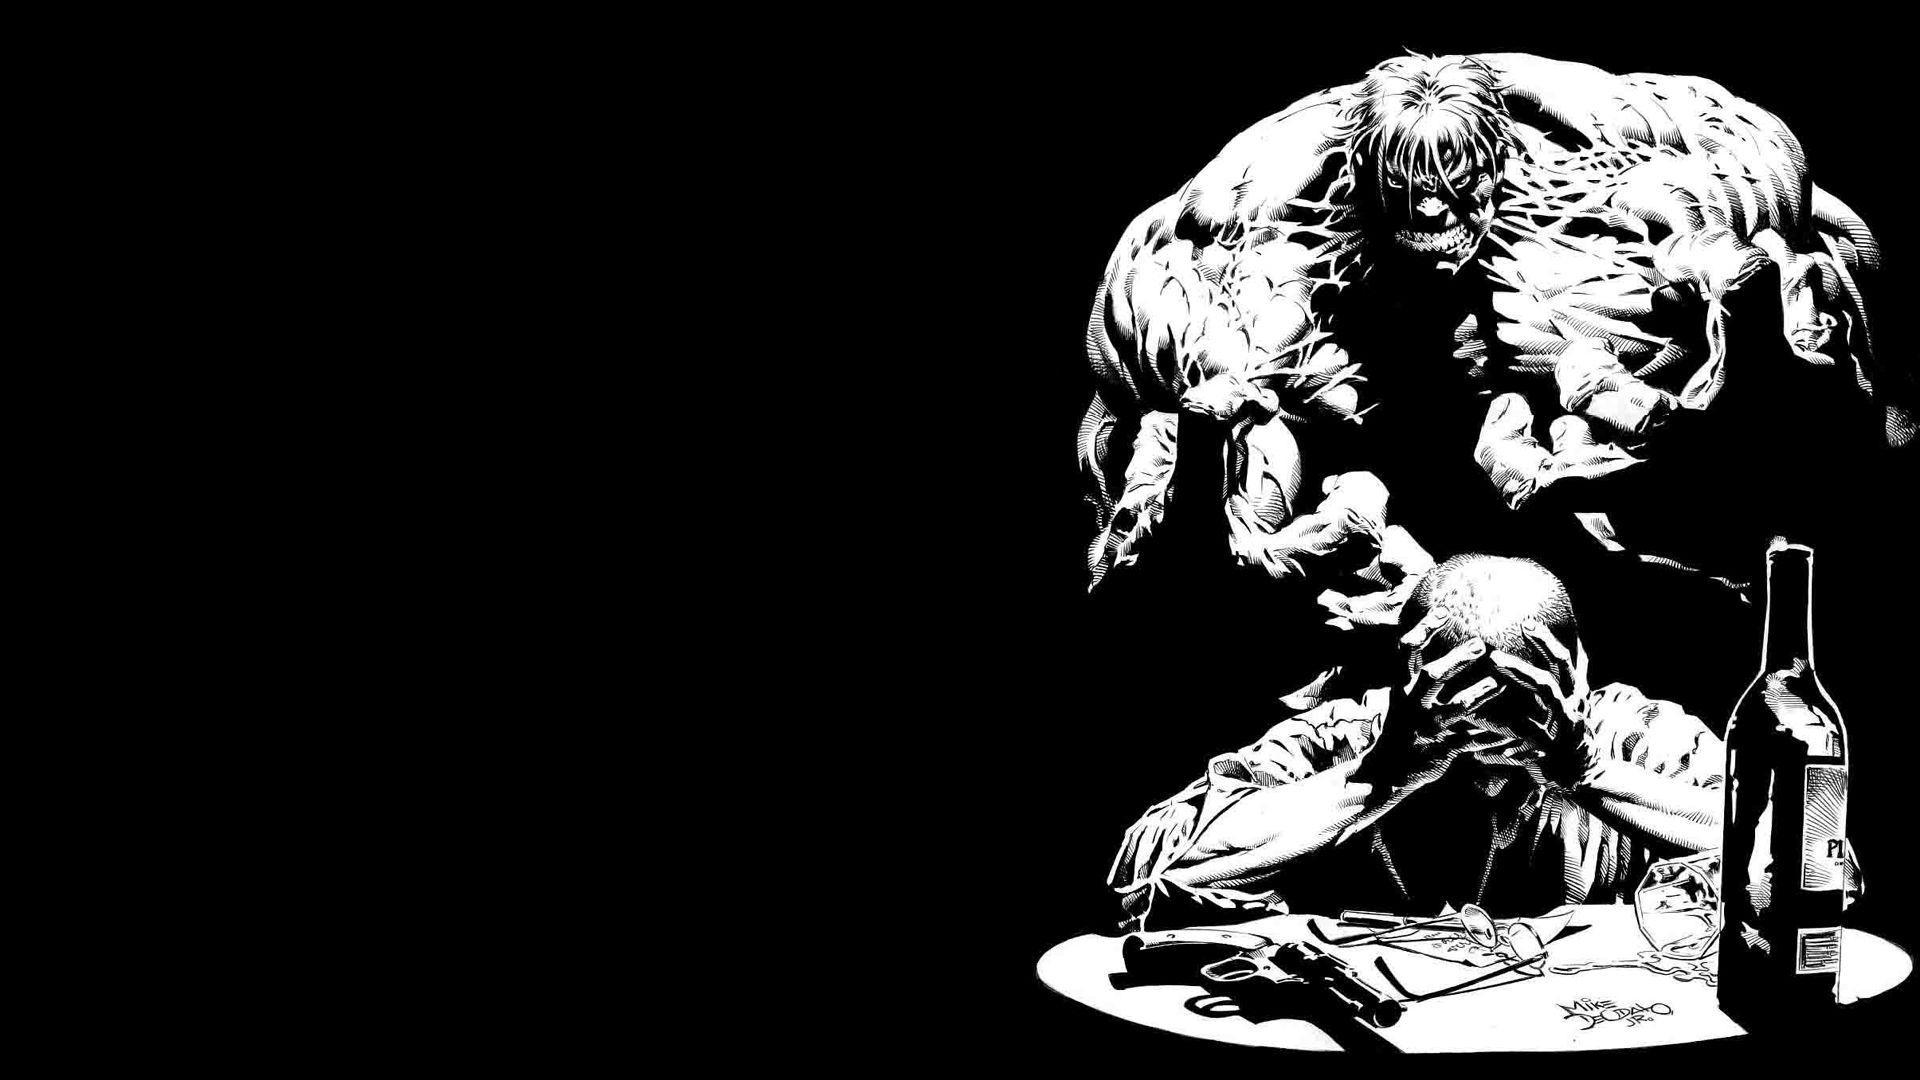 Hulk Black Wallpapers Top Free Hulk Black Backgrounds